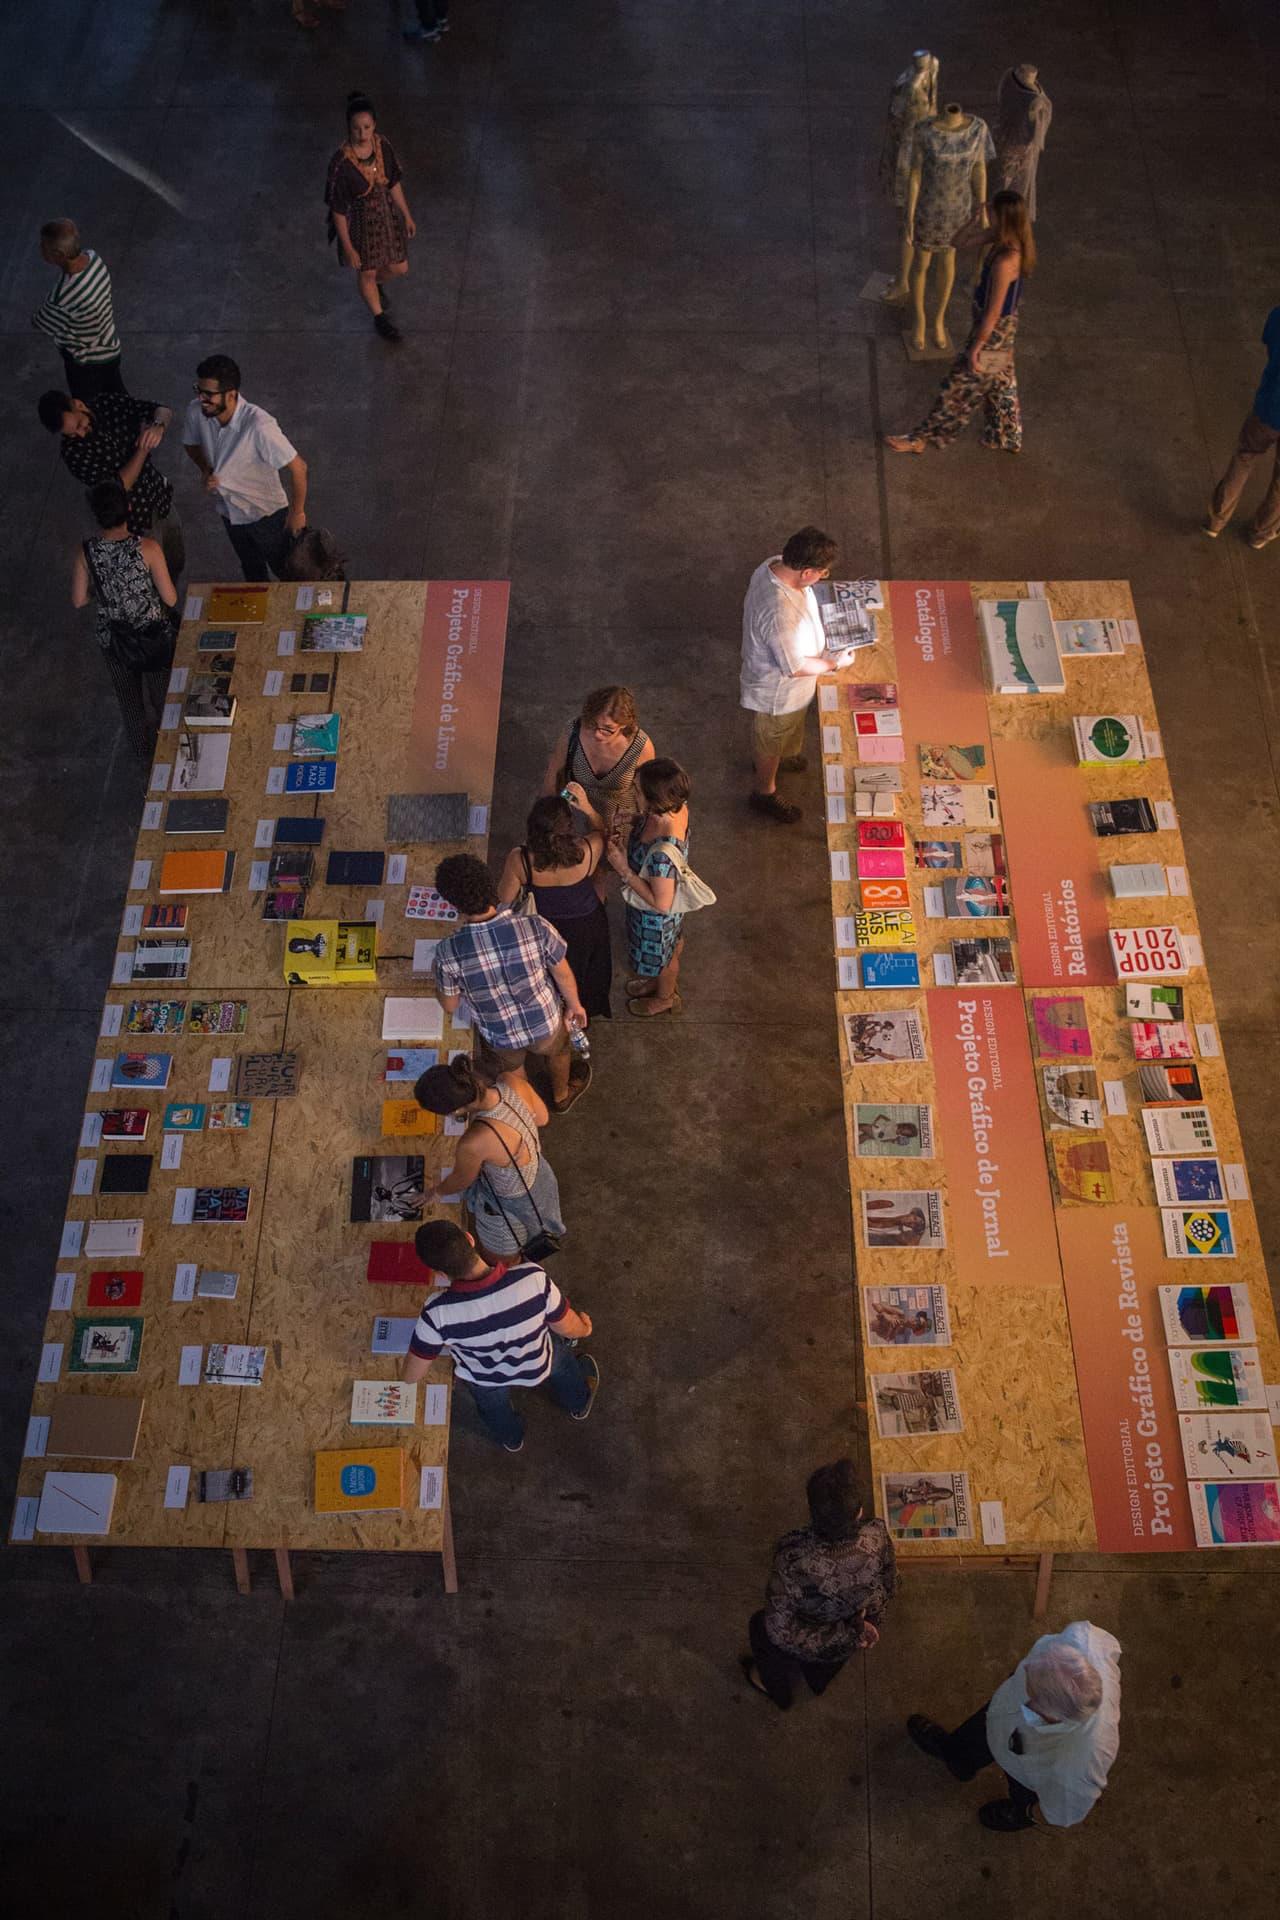 ADG_Bienal2015_Fotografia_CapimFilmes-43-1